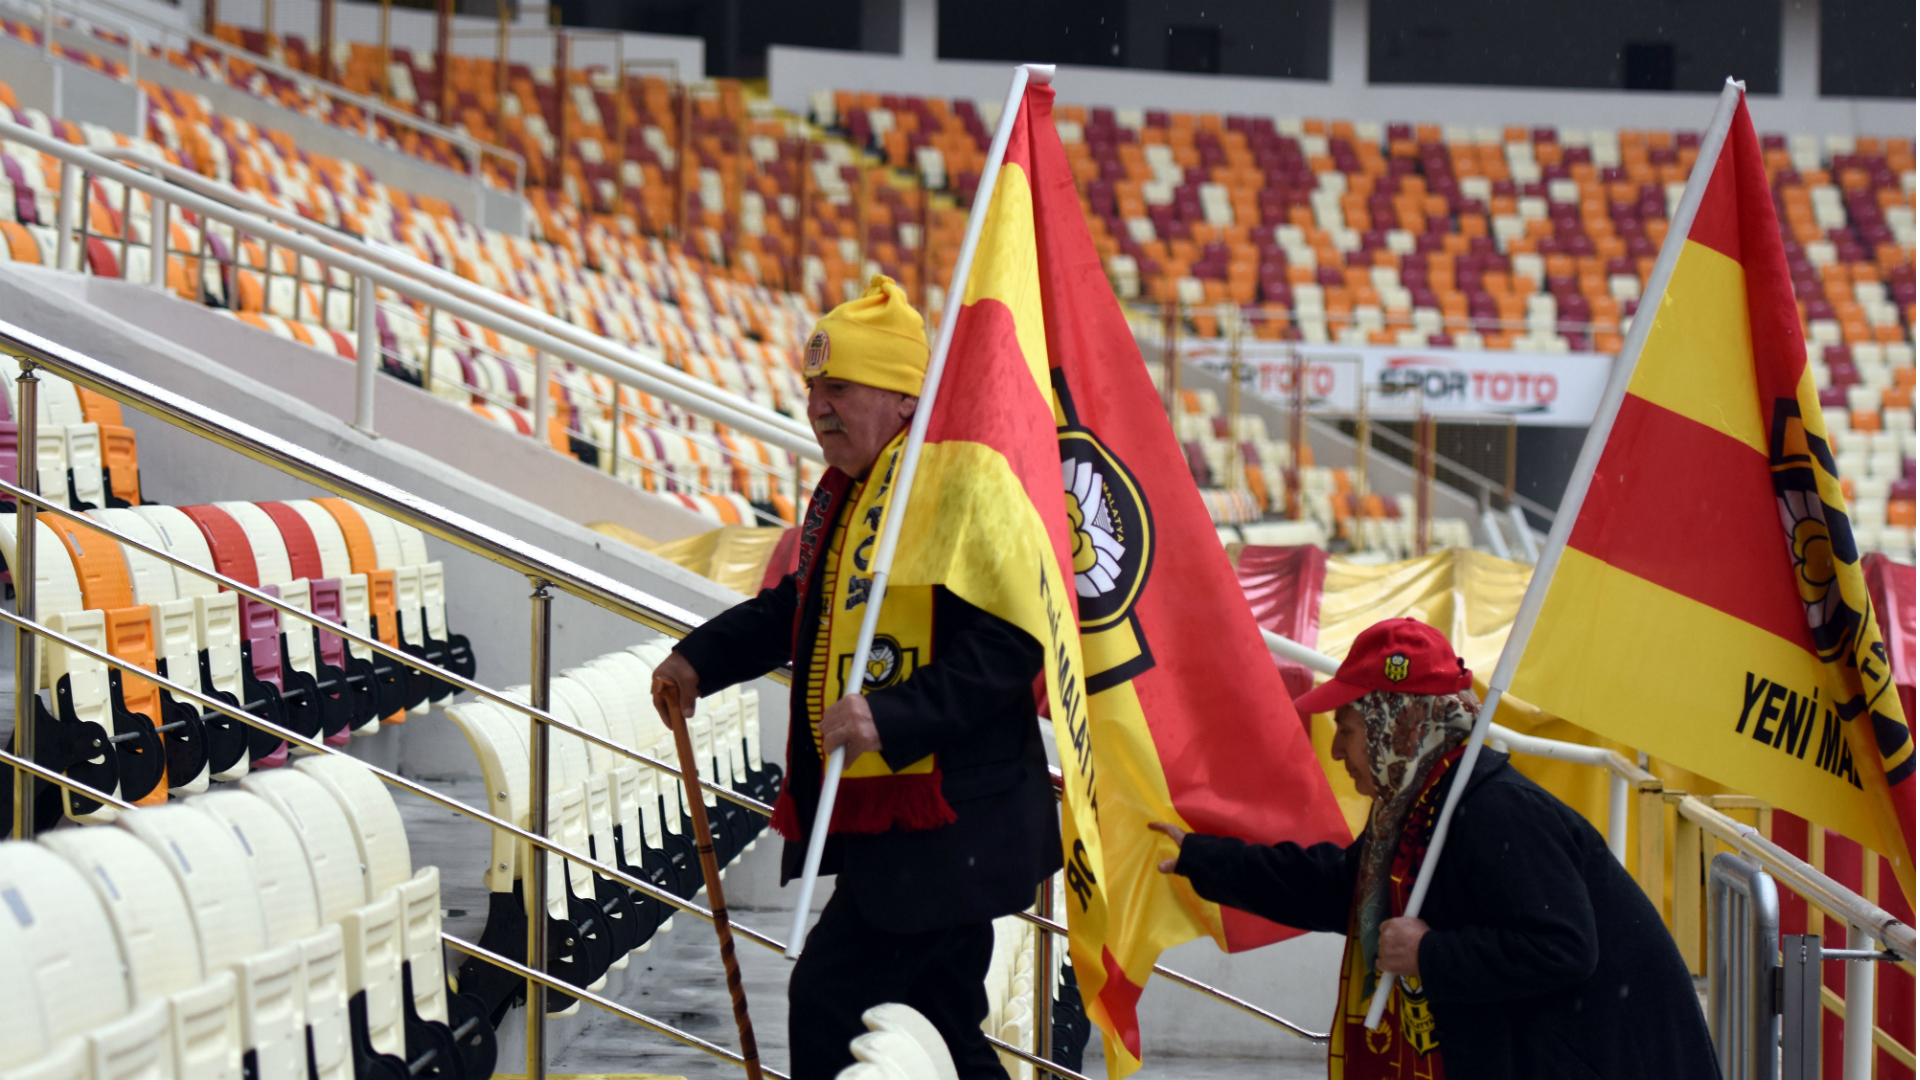 yeni malatyaspor fans